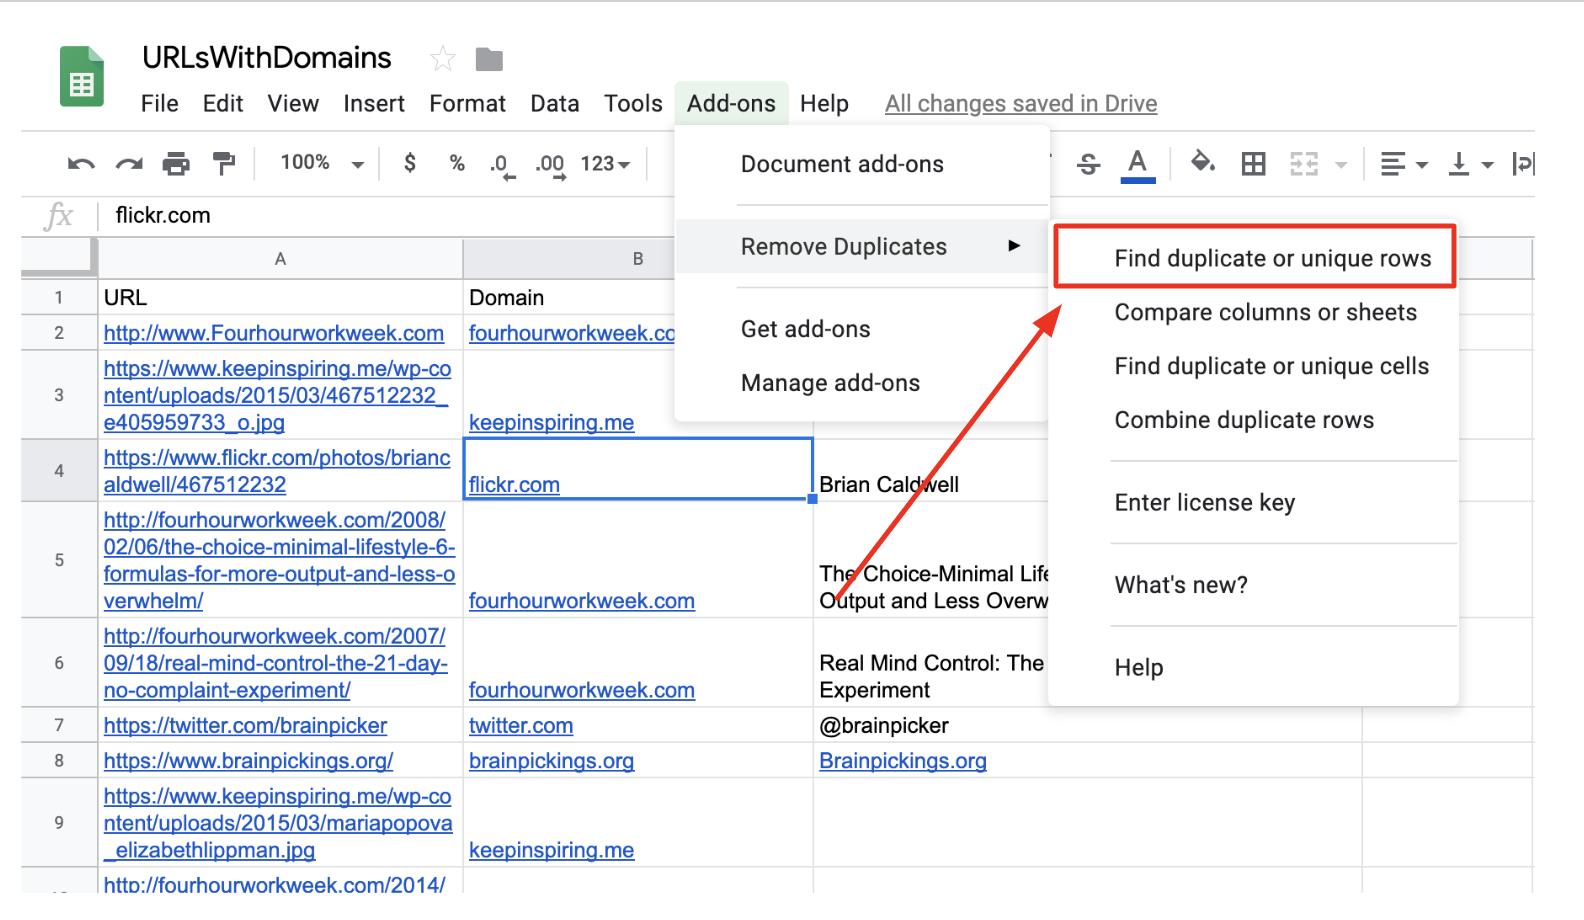 google sheets add-ons menu